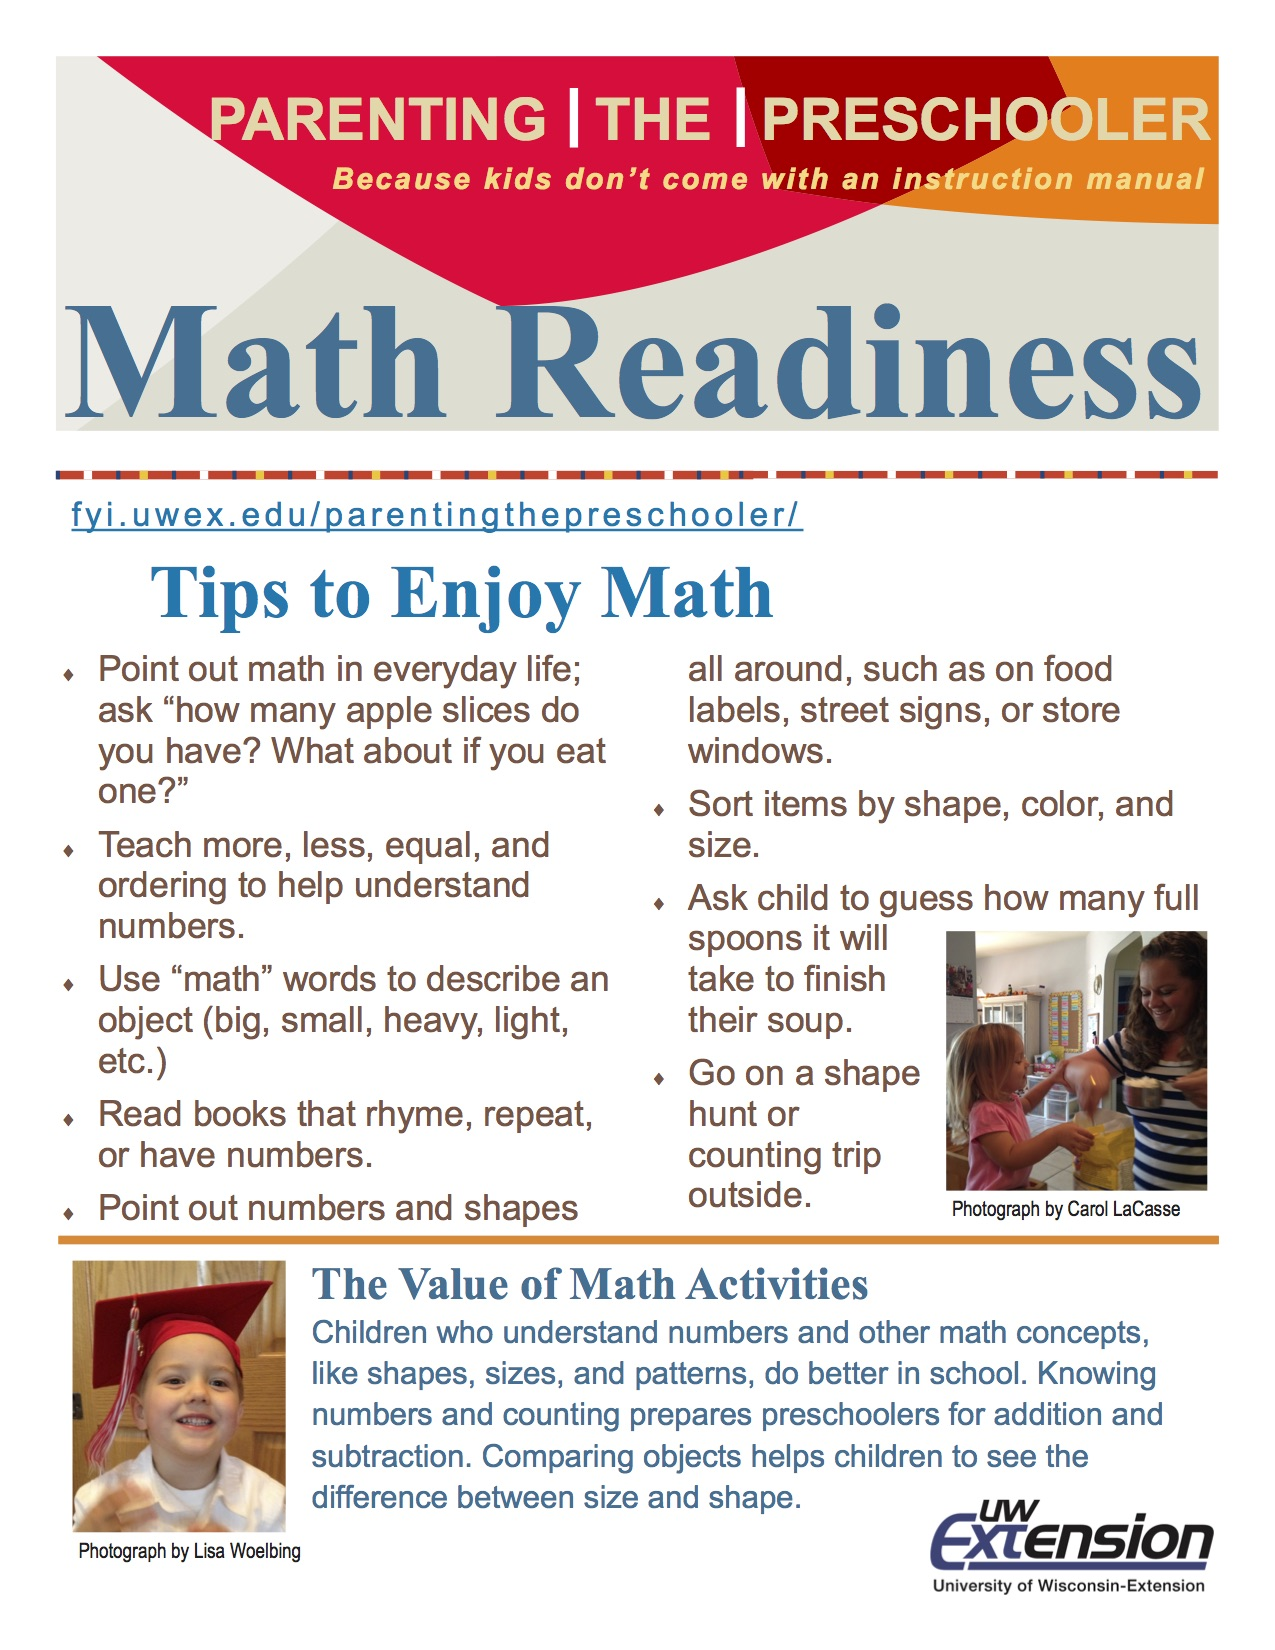 Math Readiness Parenting The Preschooler